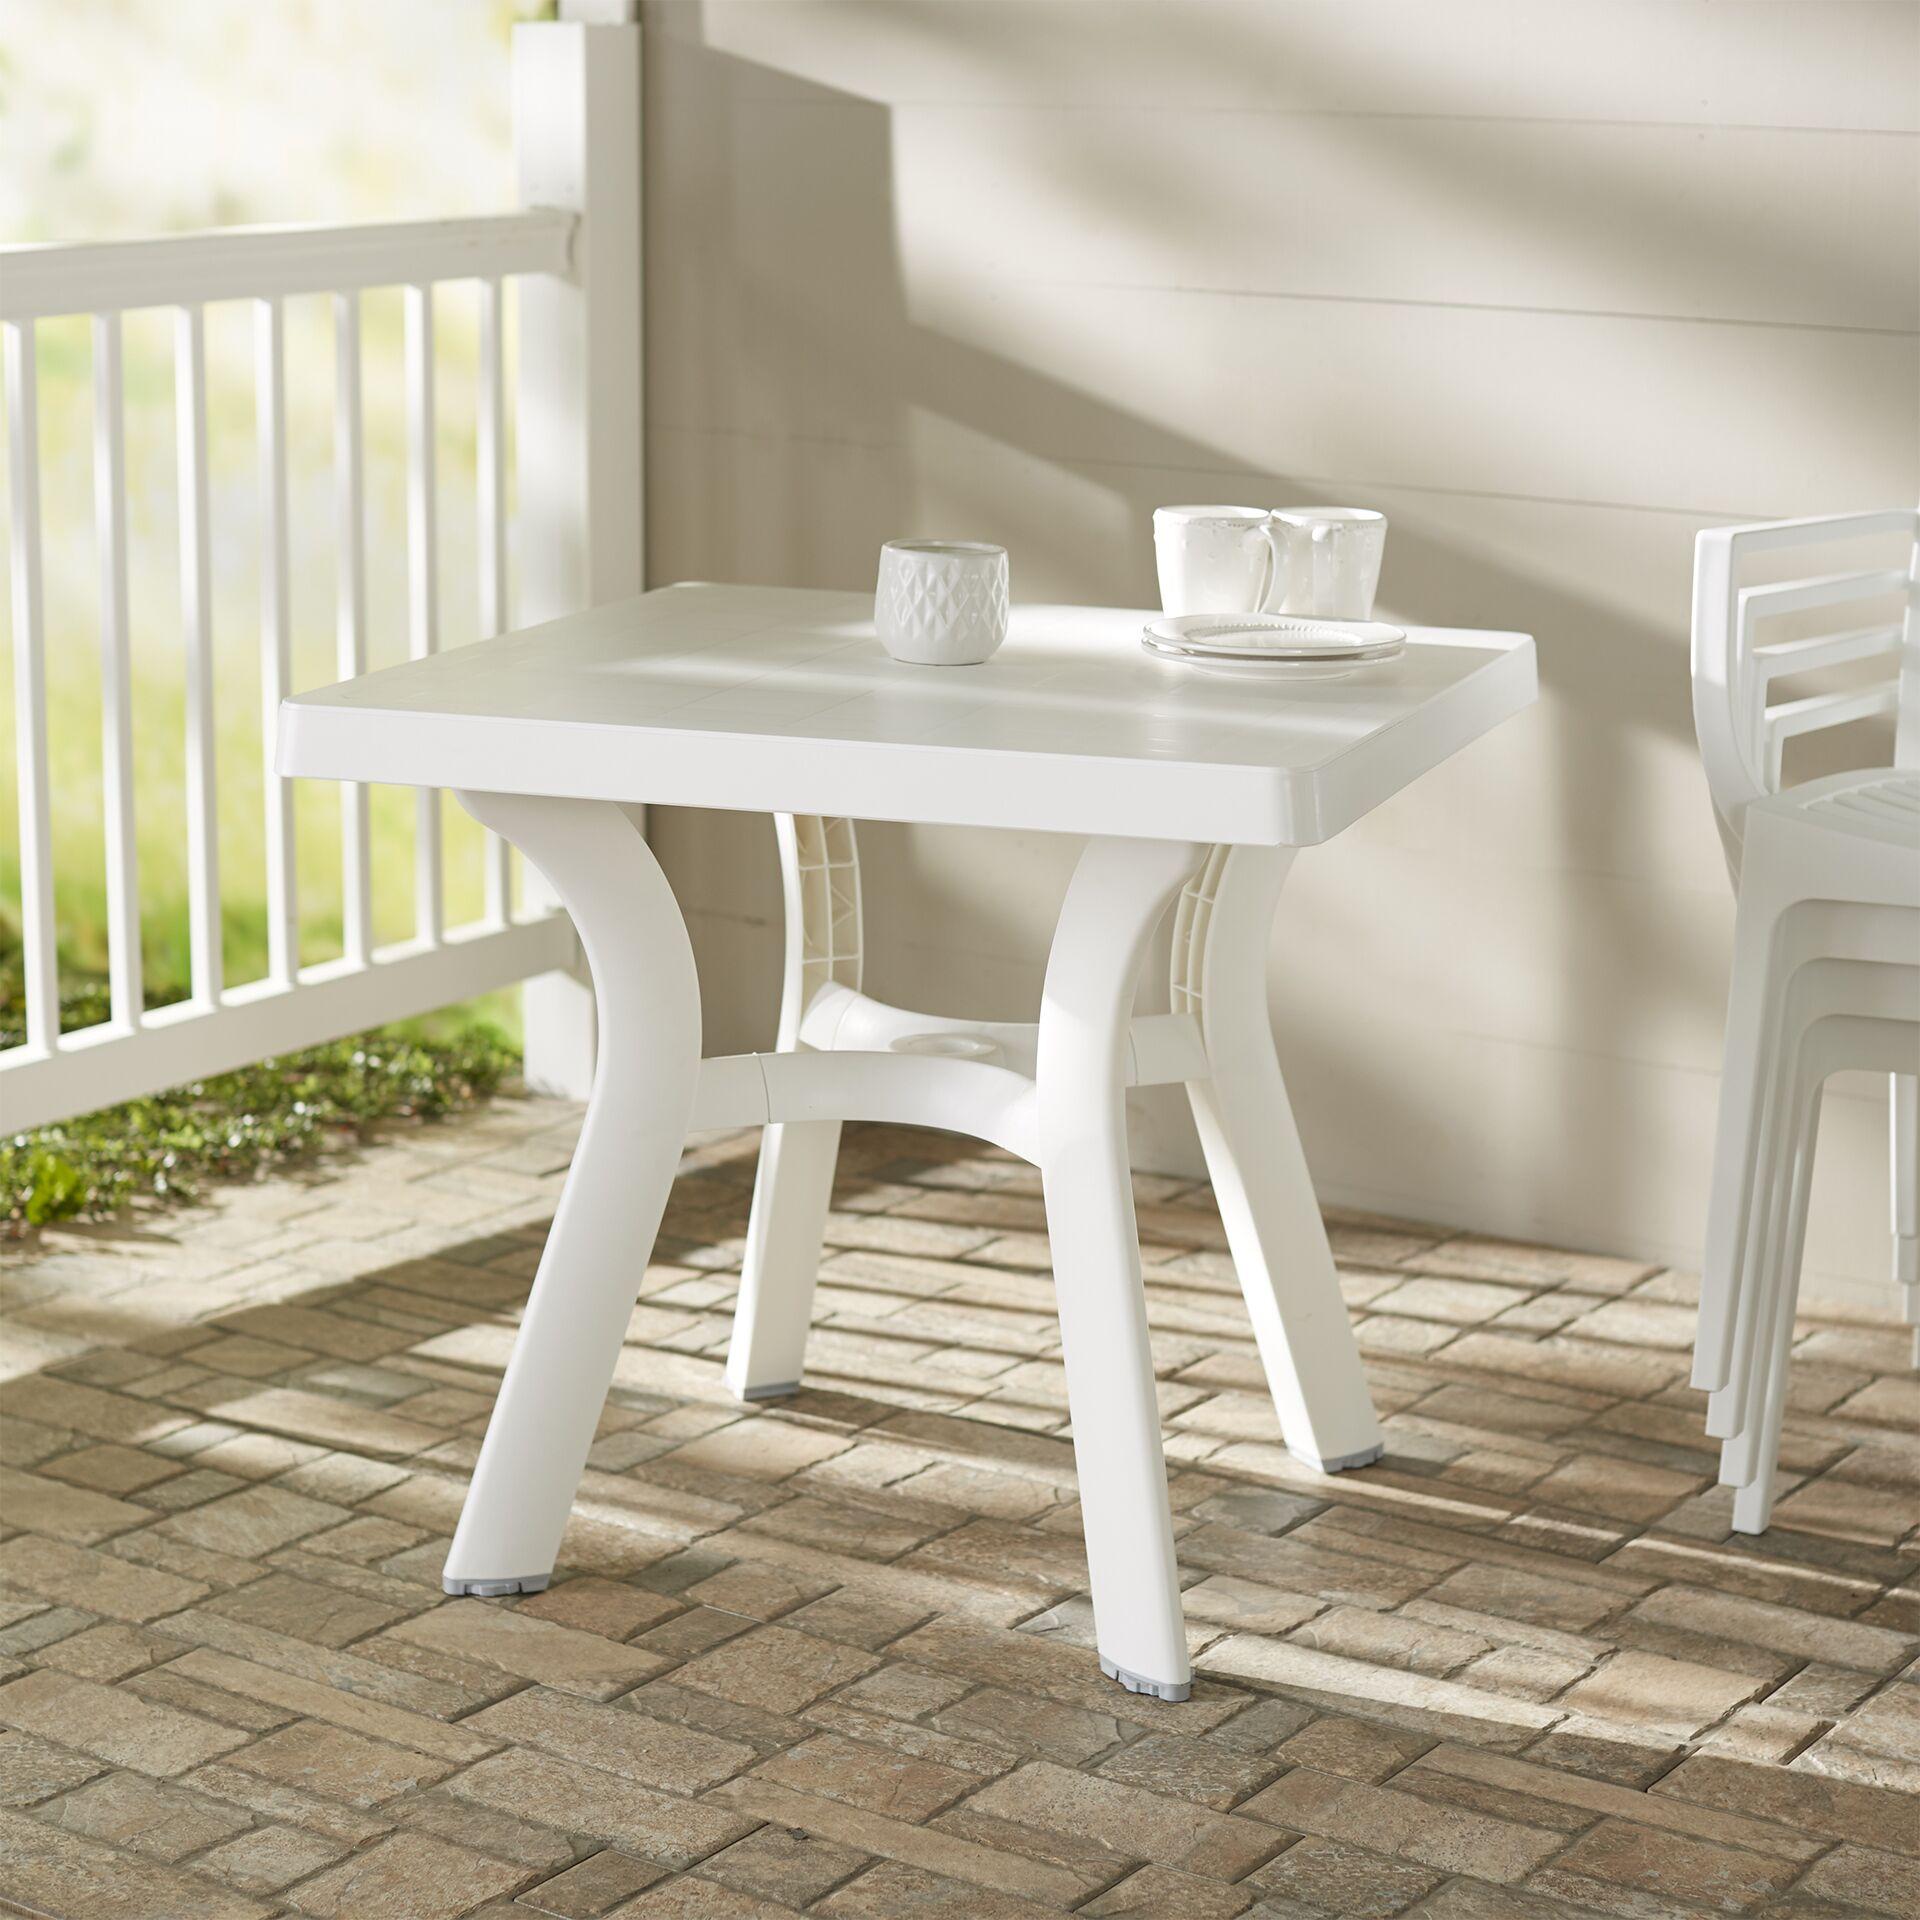 Snake River Square Dining Table Finish: White